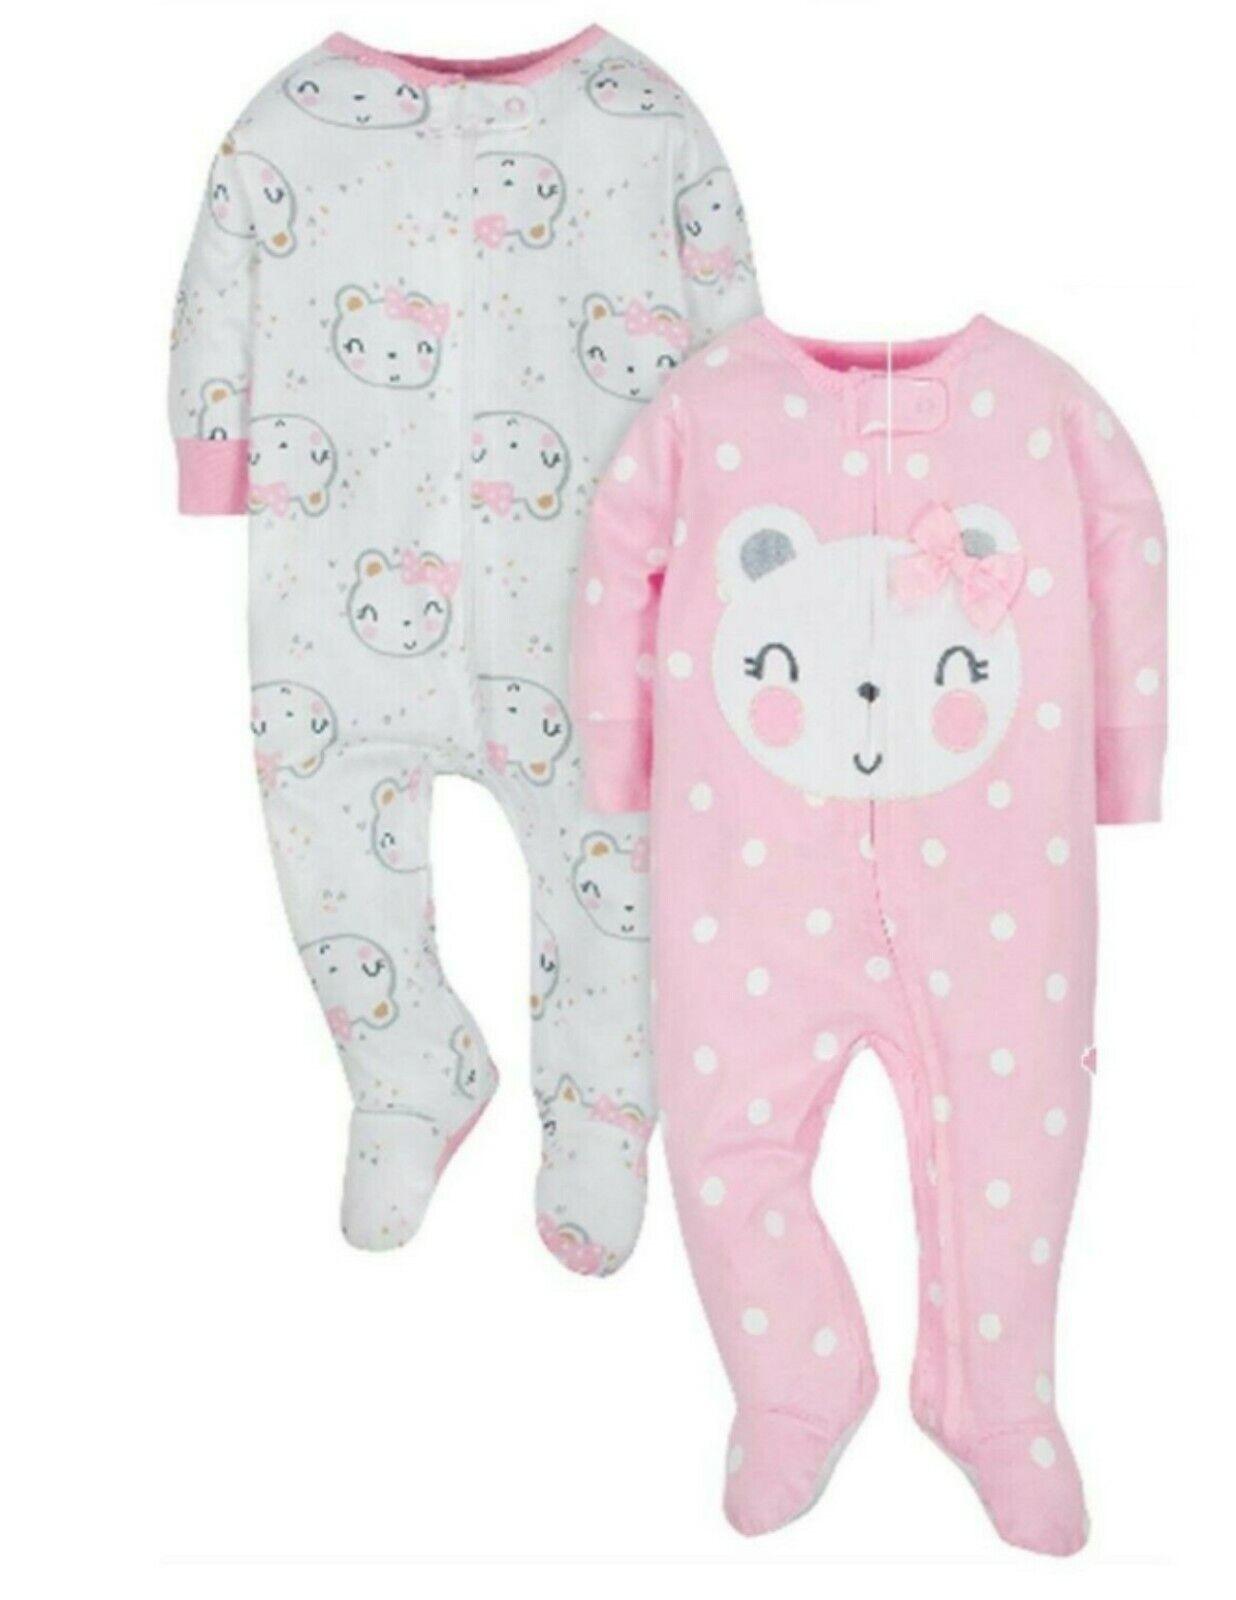 Gerber Baby Girls Onesies Bodysuits 3 Pack Purple Animals 3-